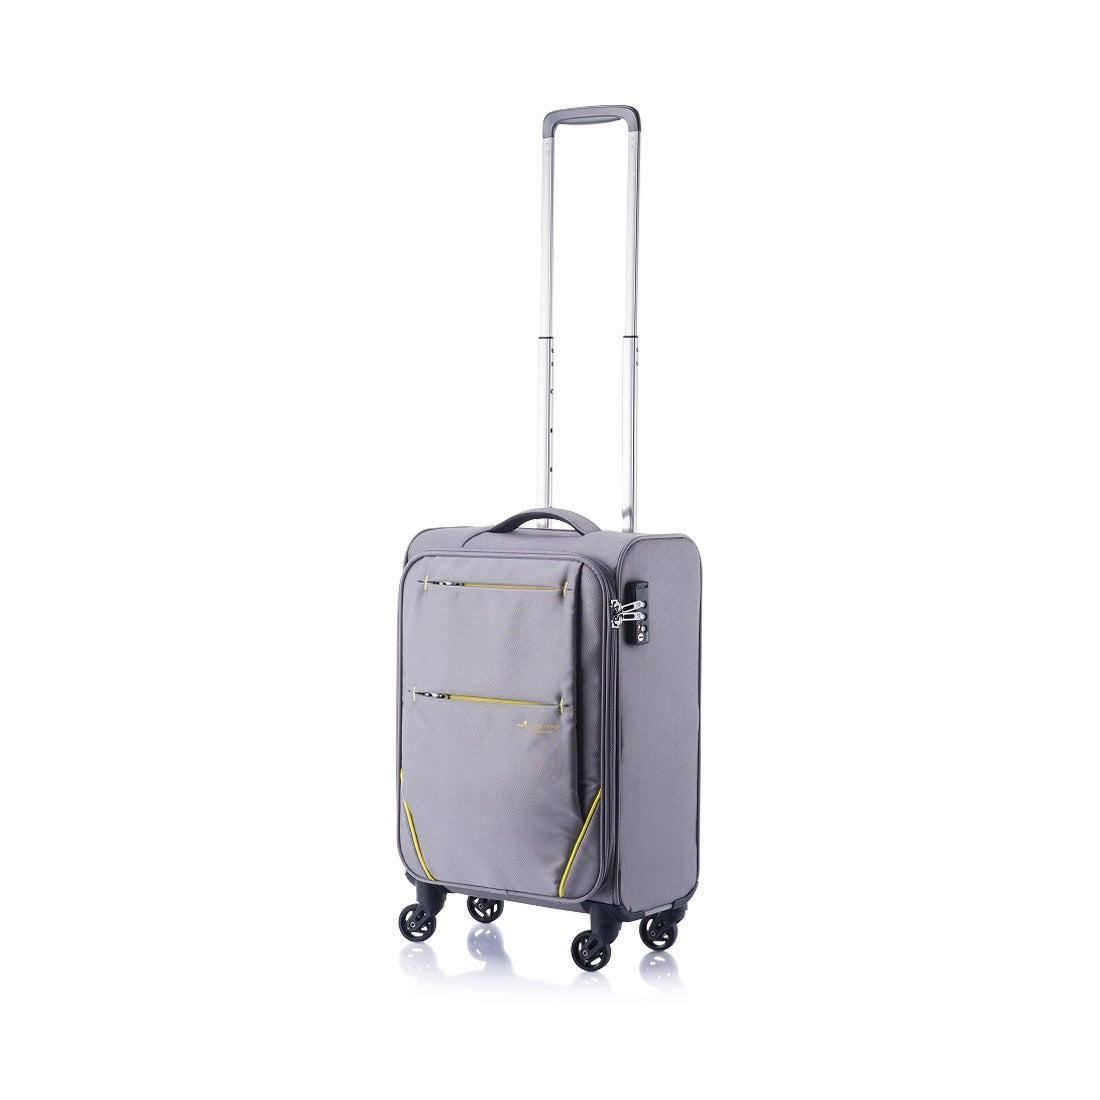 【SAC'S BAR】ヒデオワカマツ HIDEO WAKAMATSU スーツケース フライII 85-7600 46cm 【5】グレー メンズ